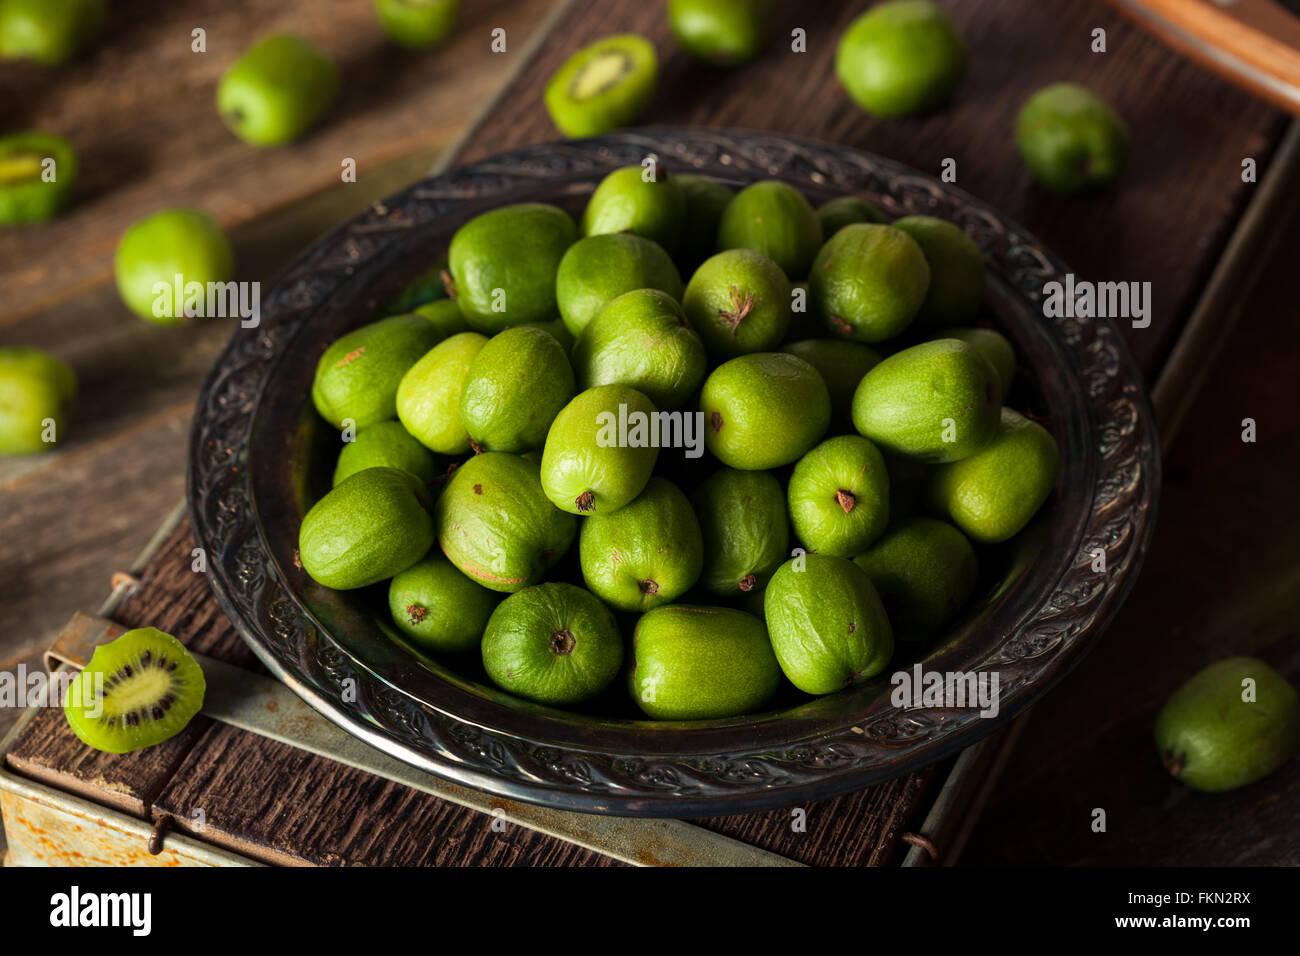 Green Organic Kiwi Berries in a Bowl - Stock Image